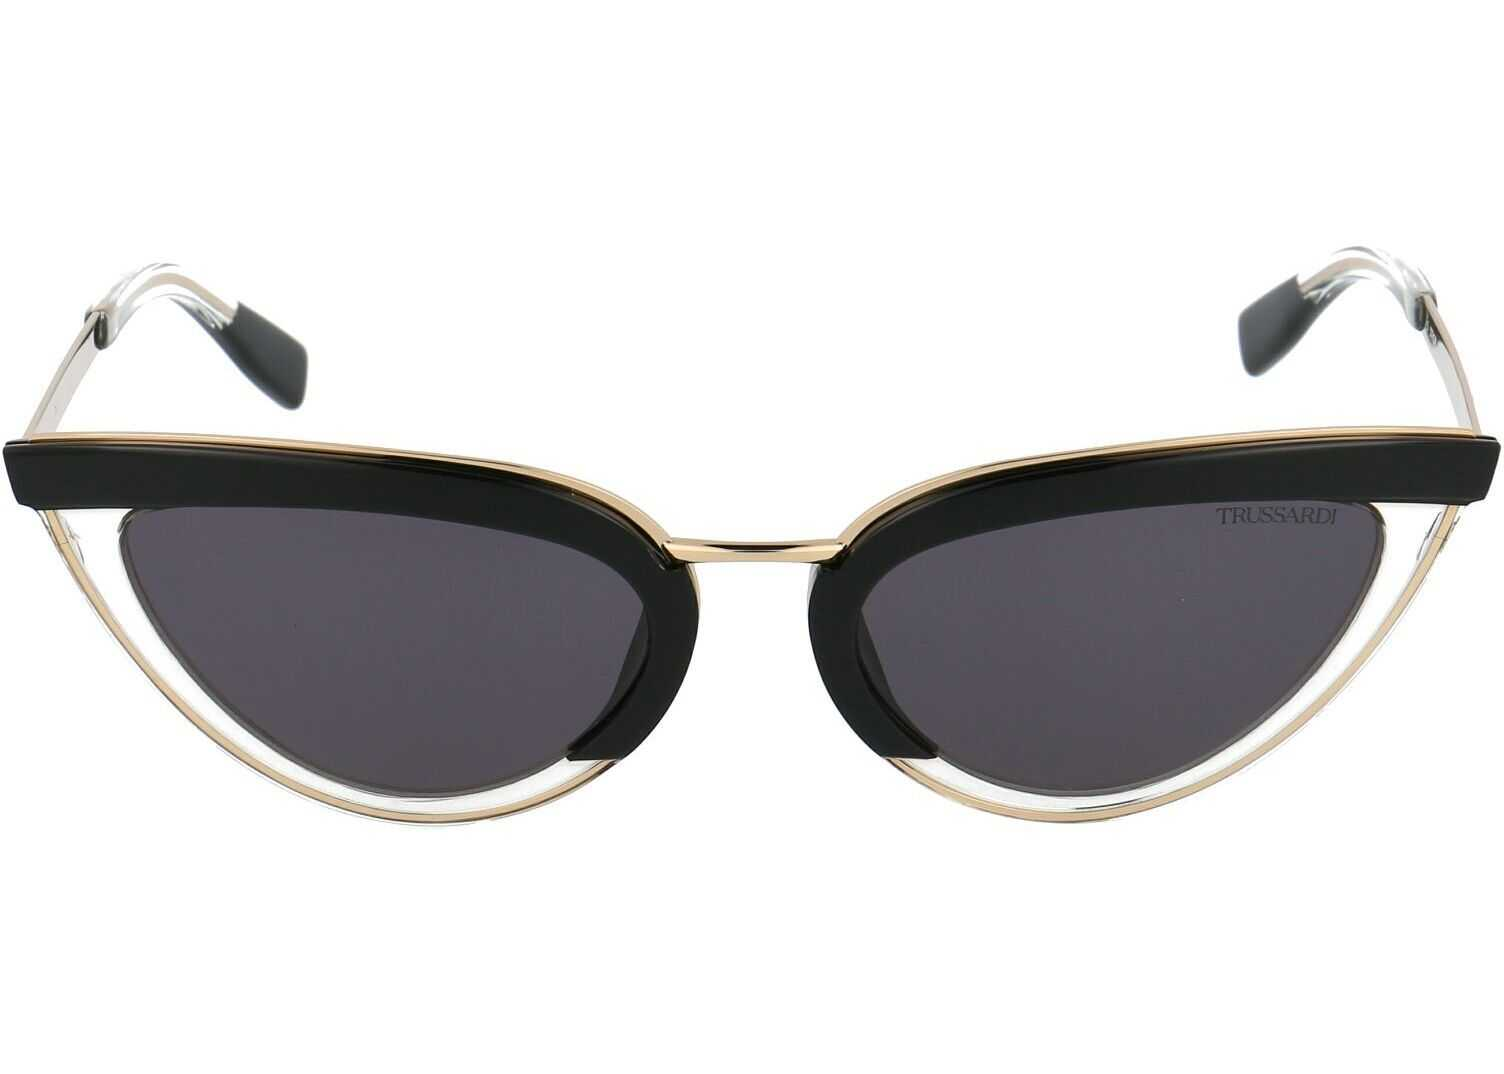 Trussardi Metal Sunglasses MULTICOLOR